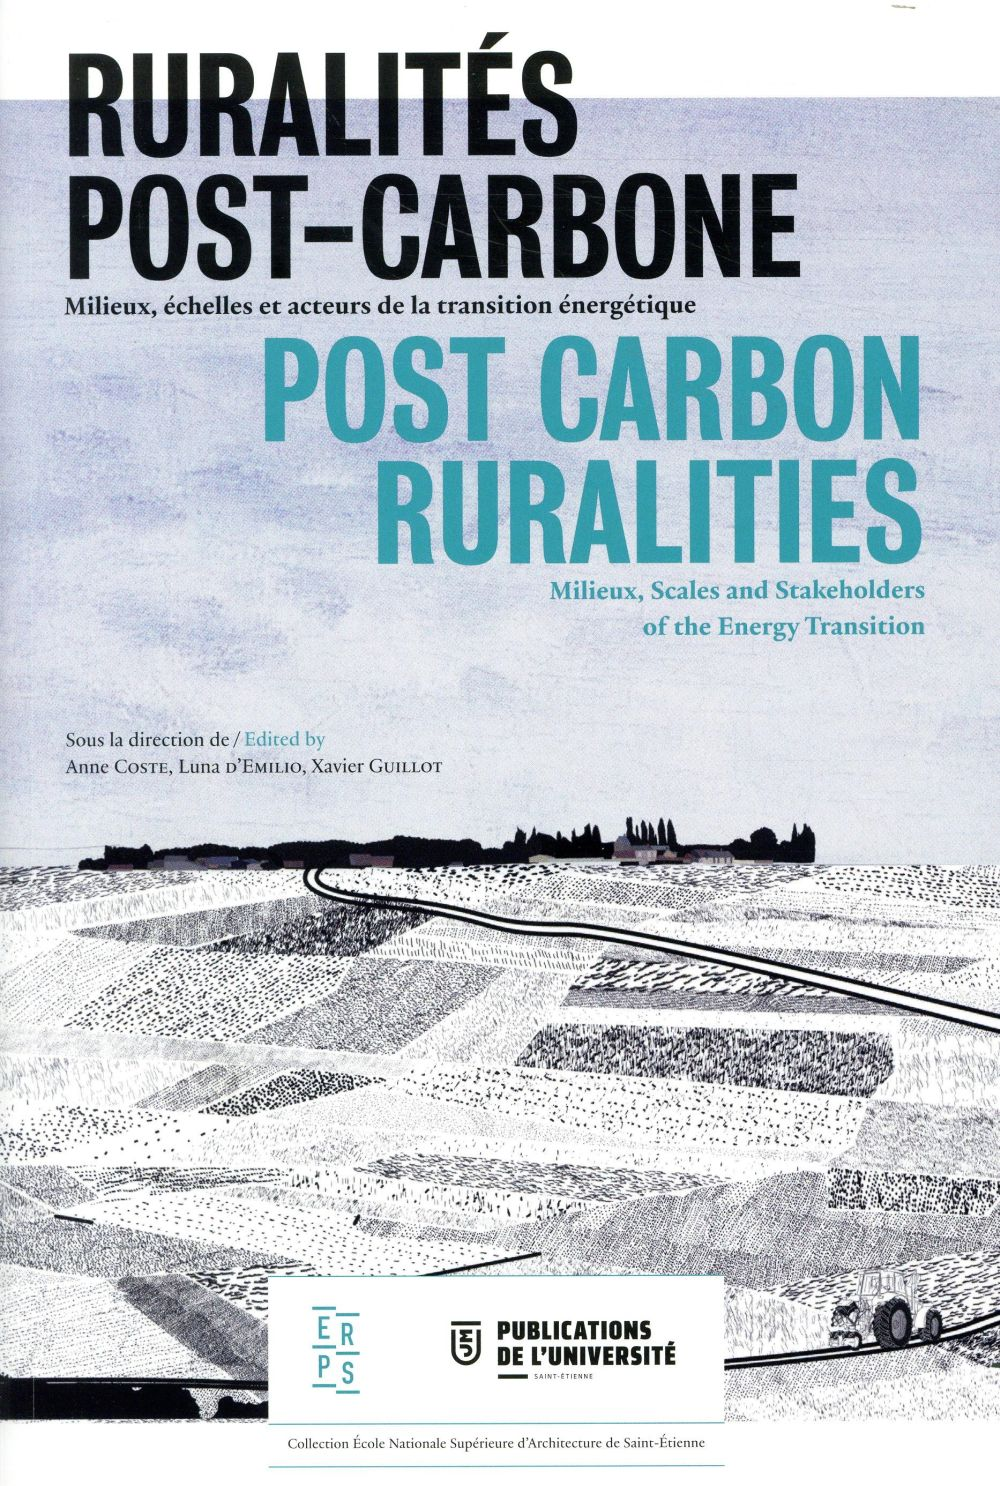 Ruralités post-carbone